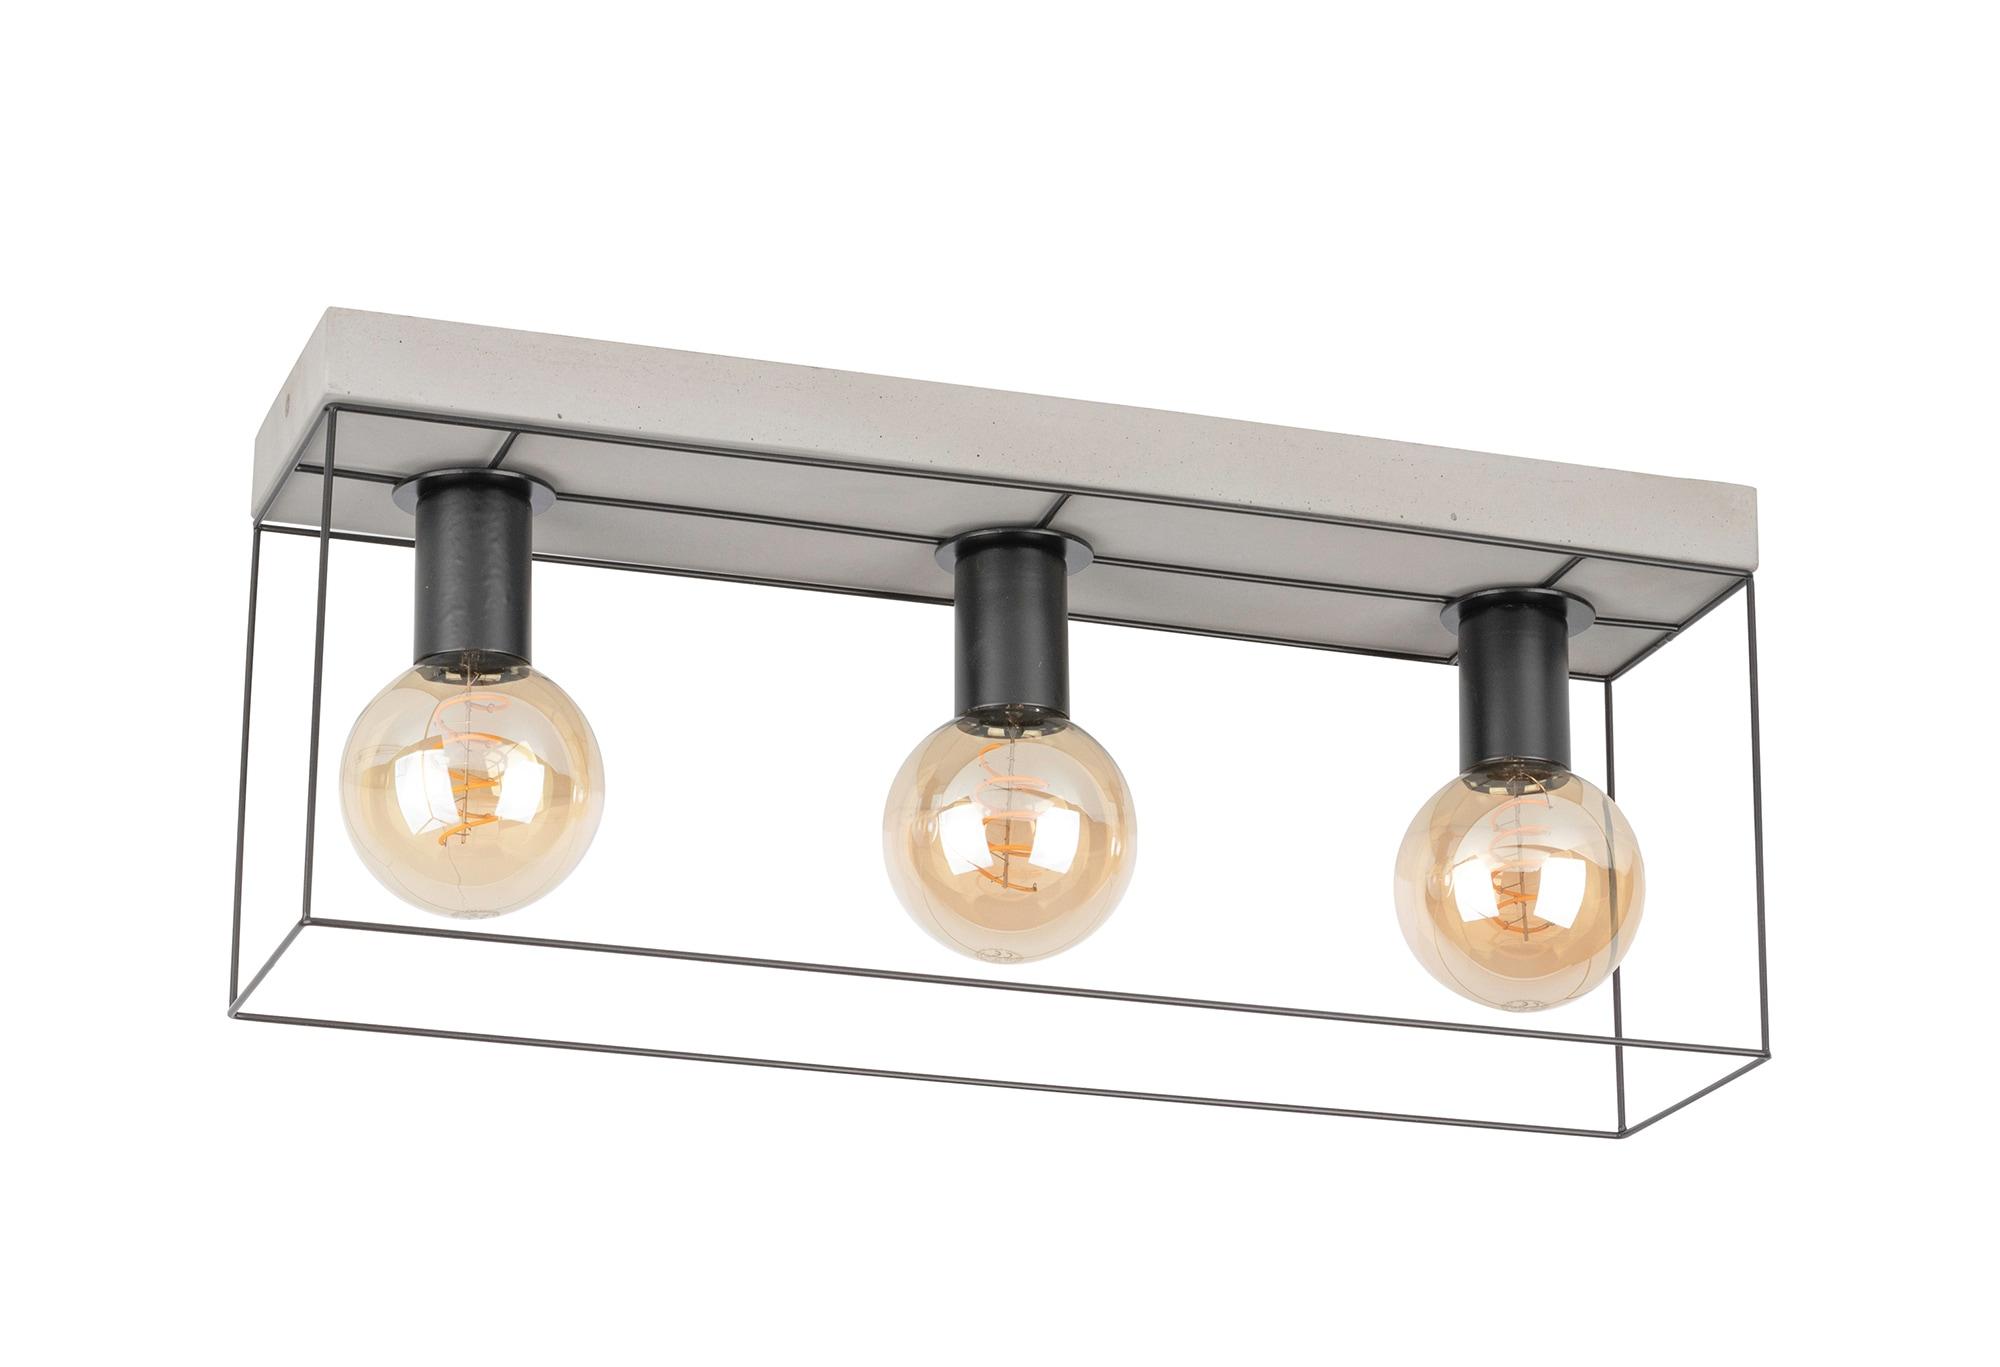 SPOT Light Deckenleuchte GRETTER CONCRETE, E27, Aus echtem Beton und Metall, passende LM E27 / exklusive, Naturprodukt Made in Europe